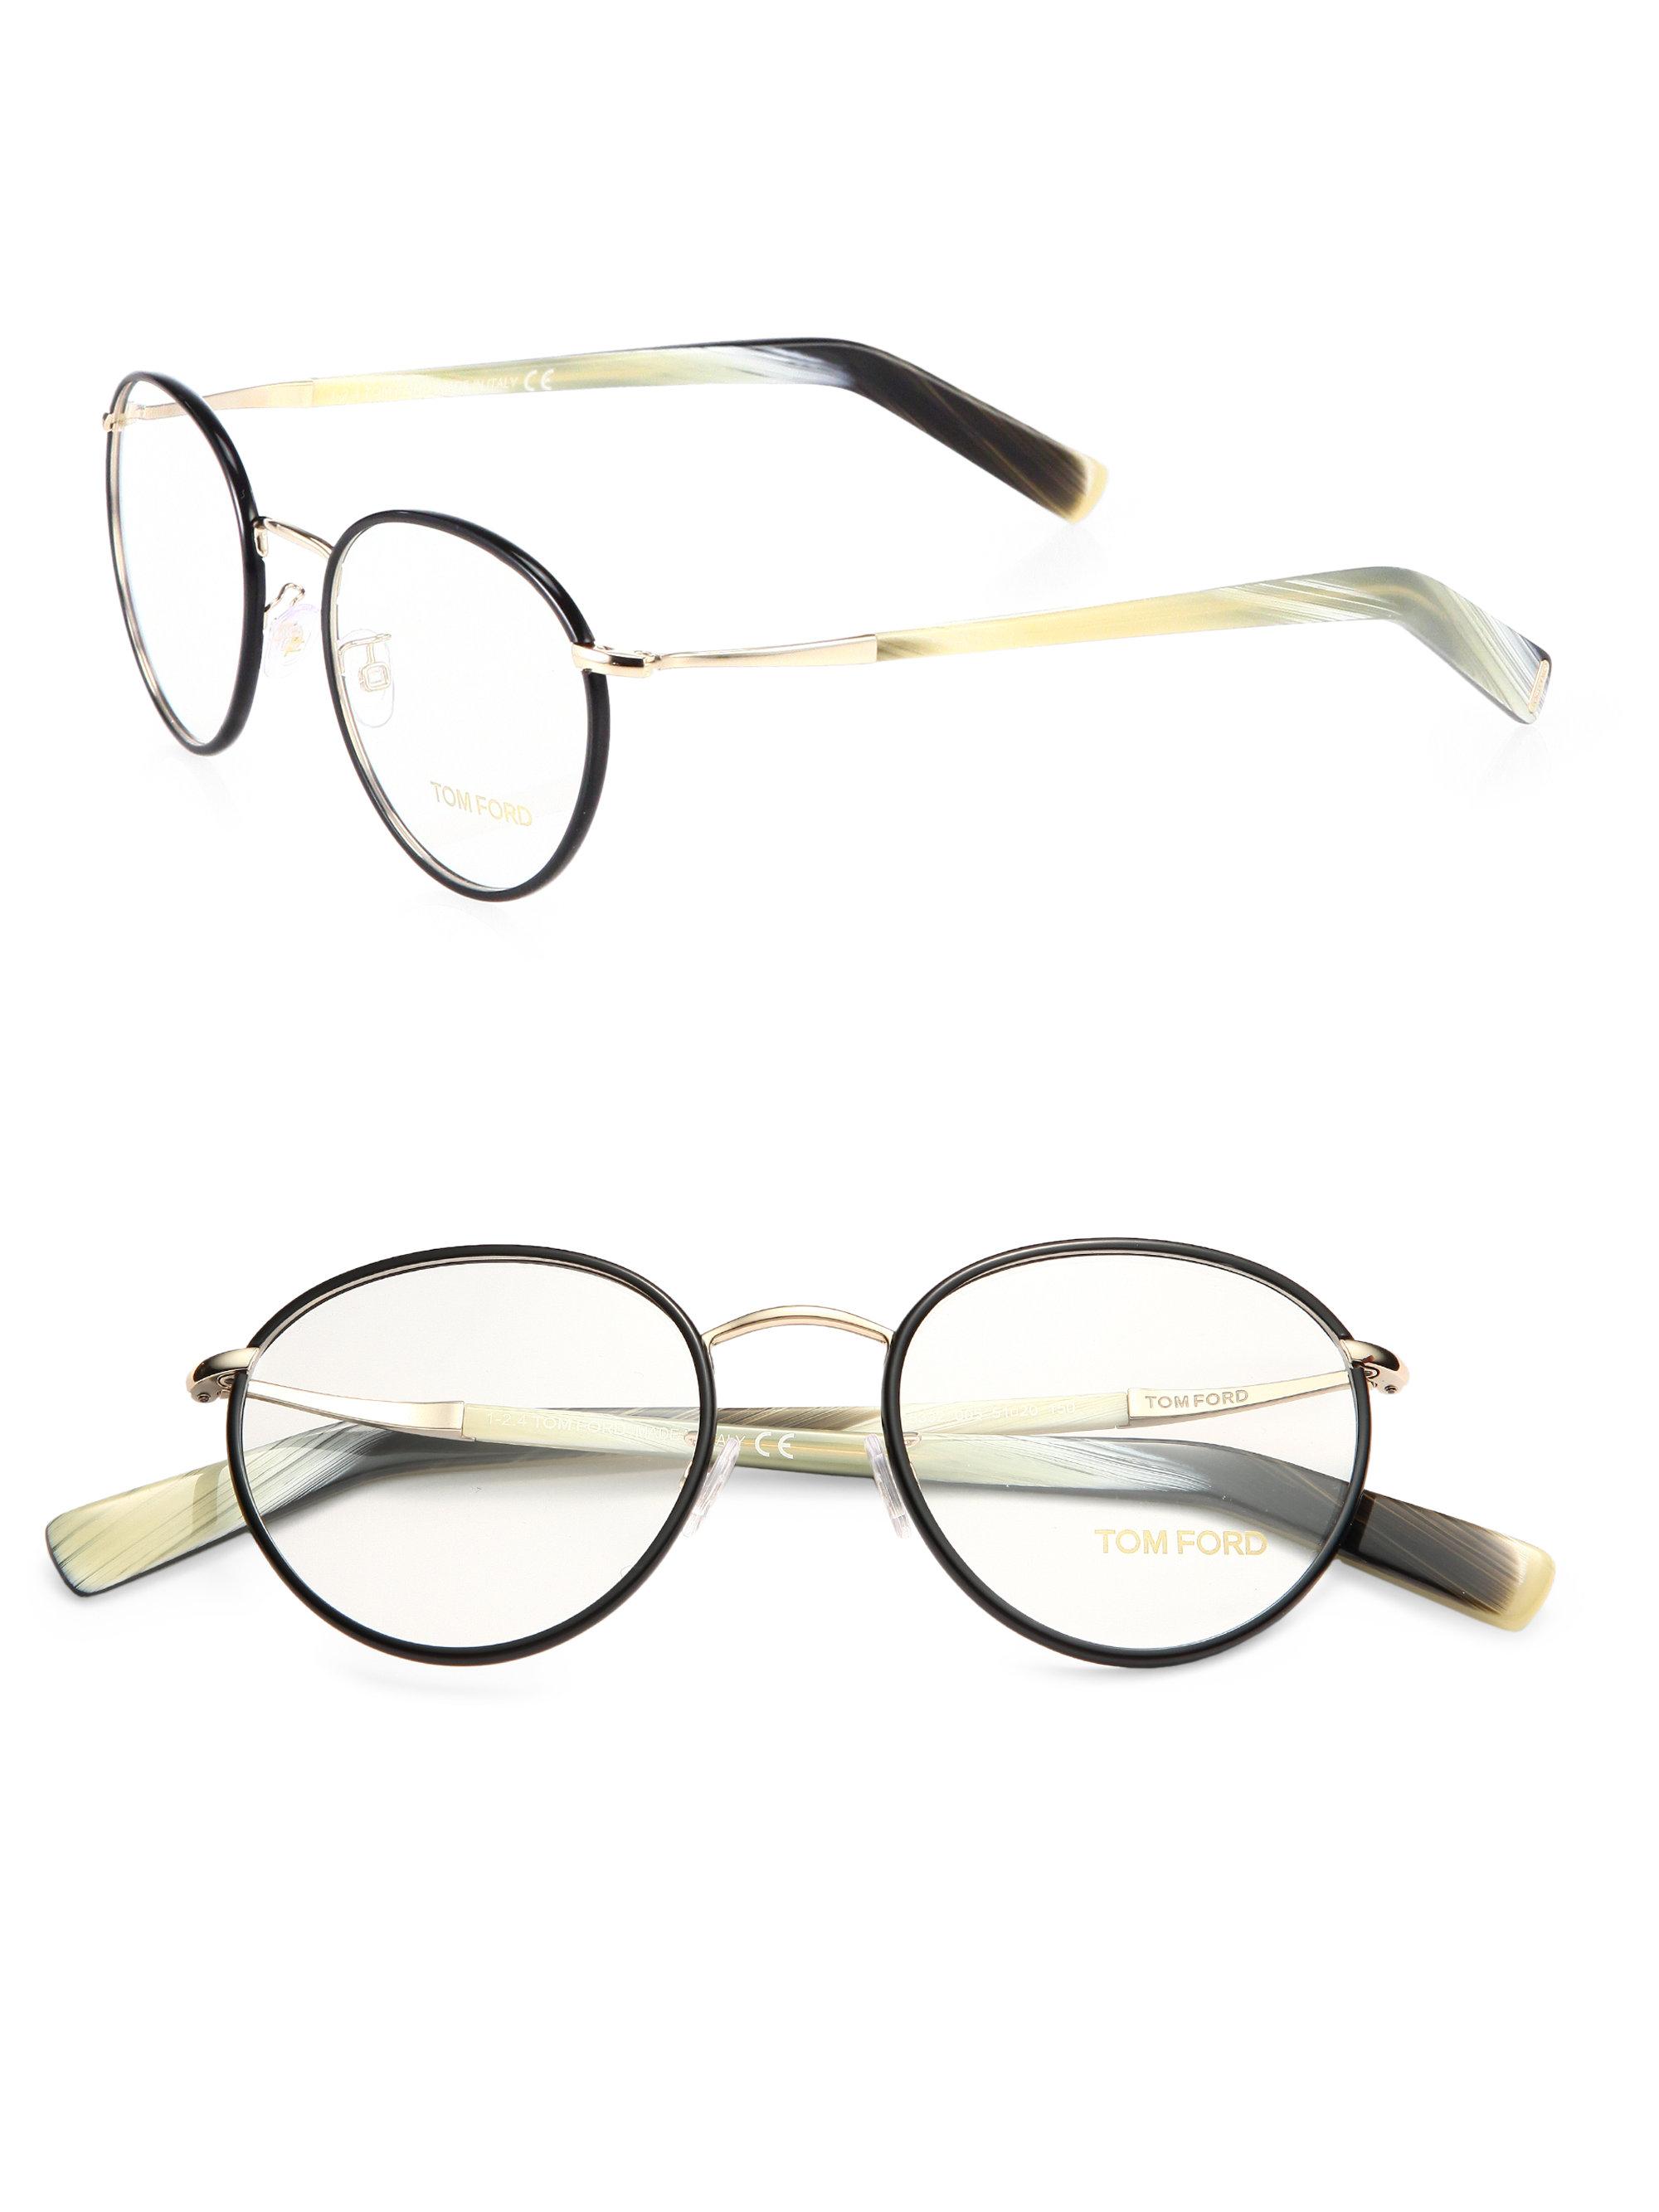 052668f880 Tom Ford Round Optical Frames in Black for Men - Lyst